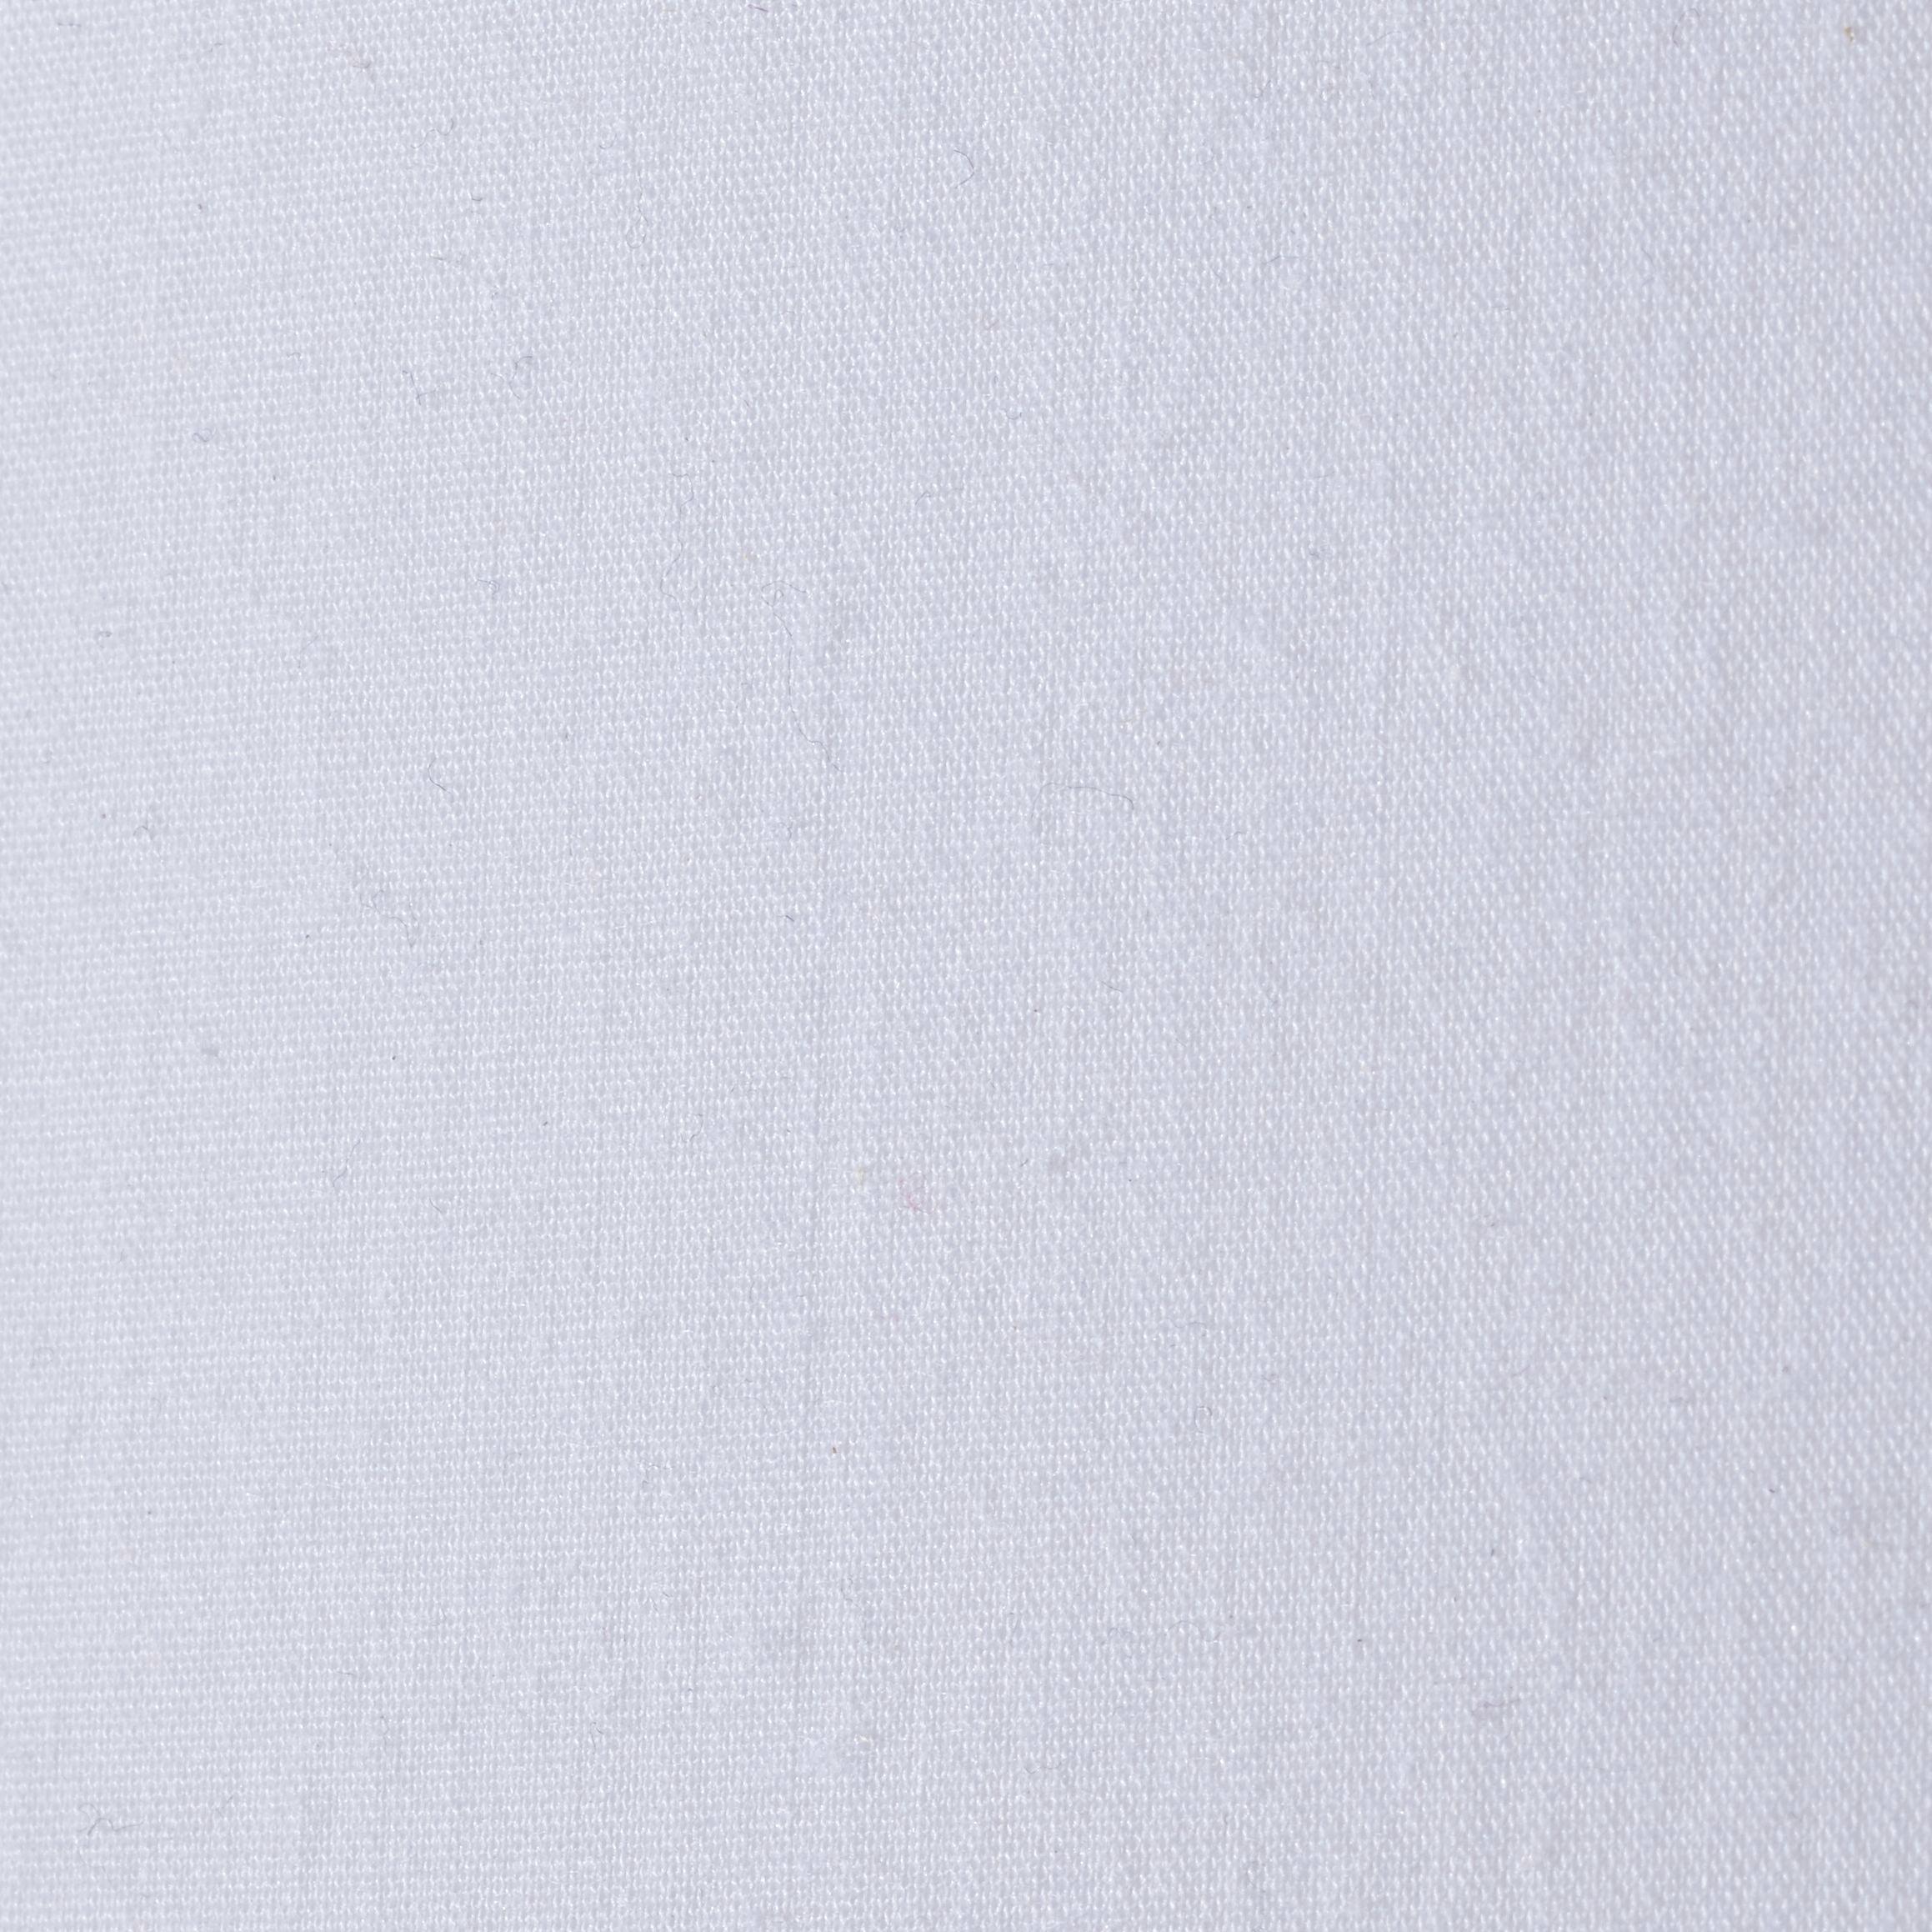 Hängeleuchte Jenny - Weiß, MODERN, Textil/Metall (40/120cm) - MÖMAX modern living